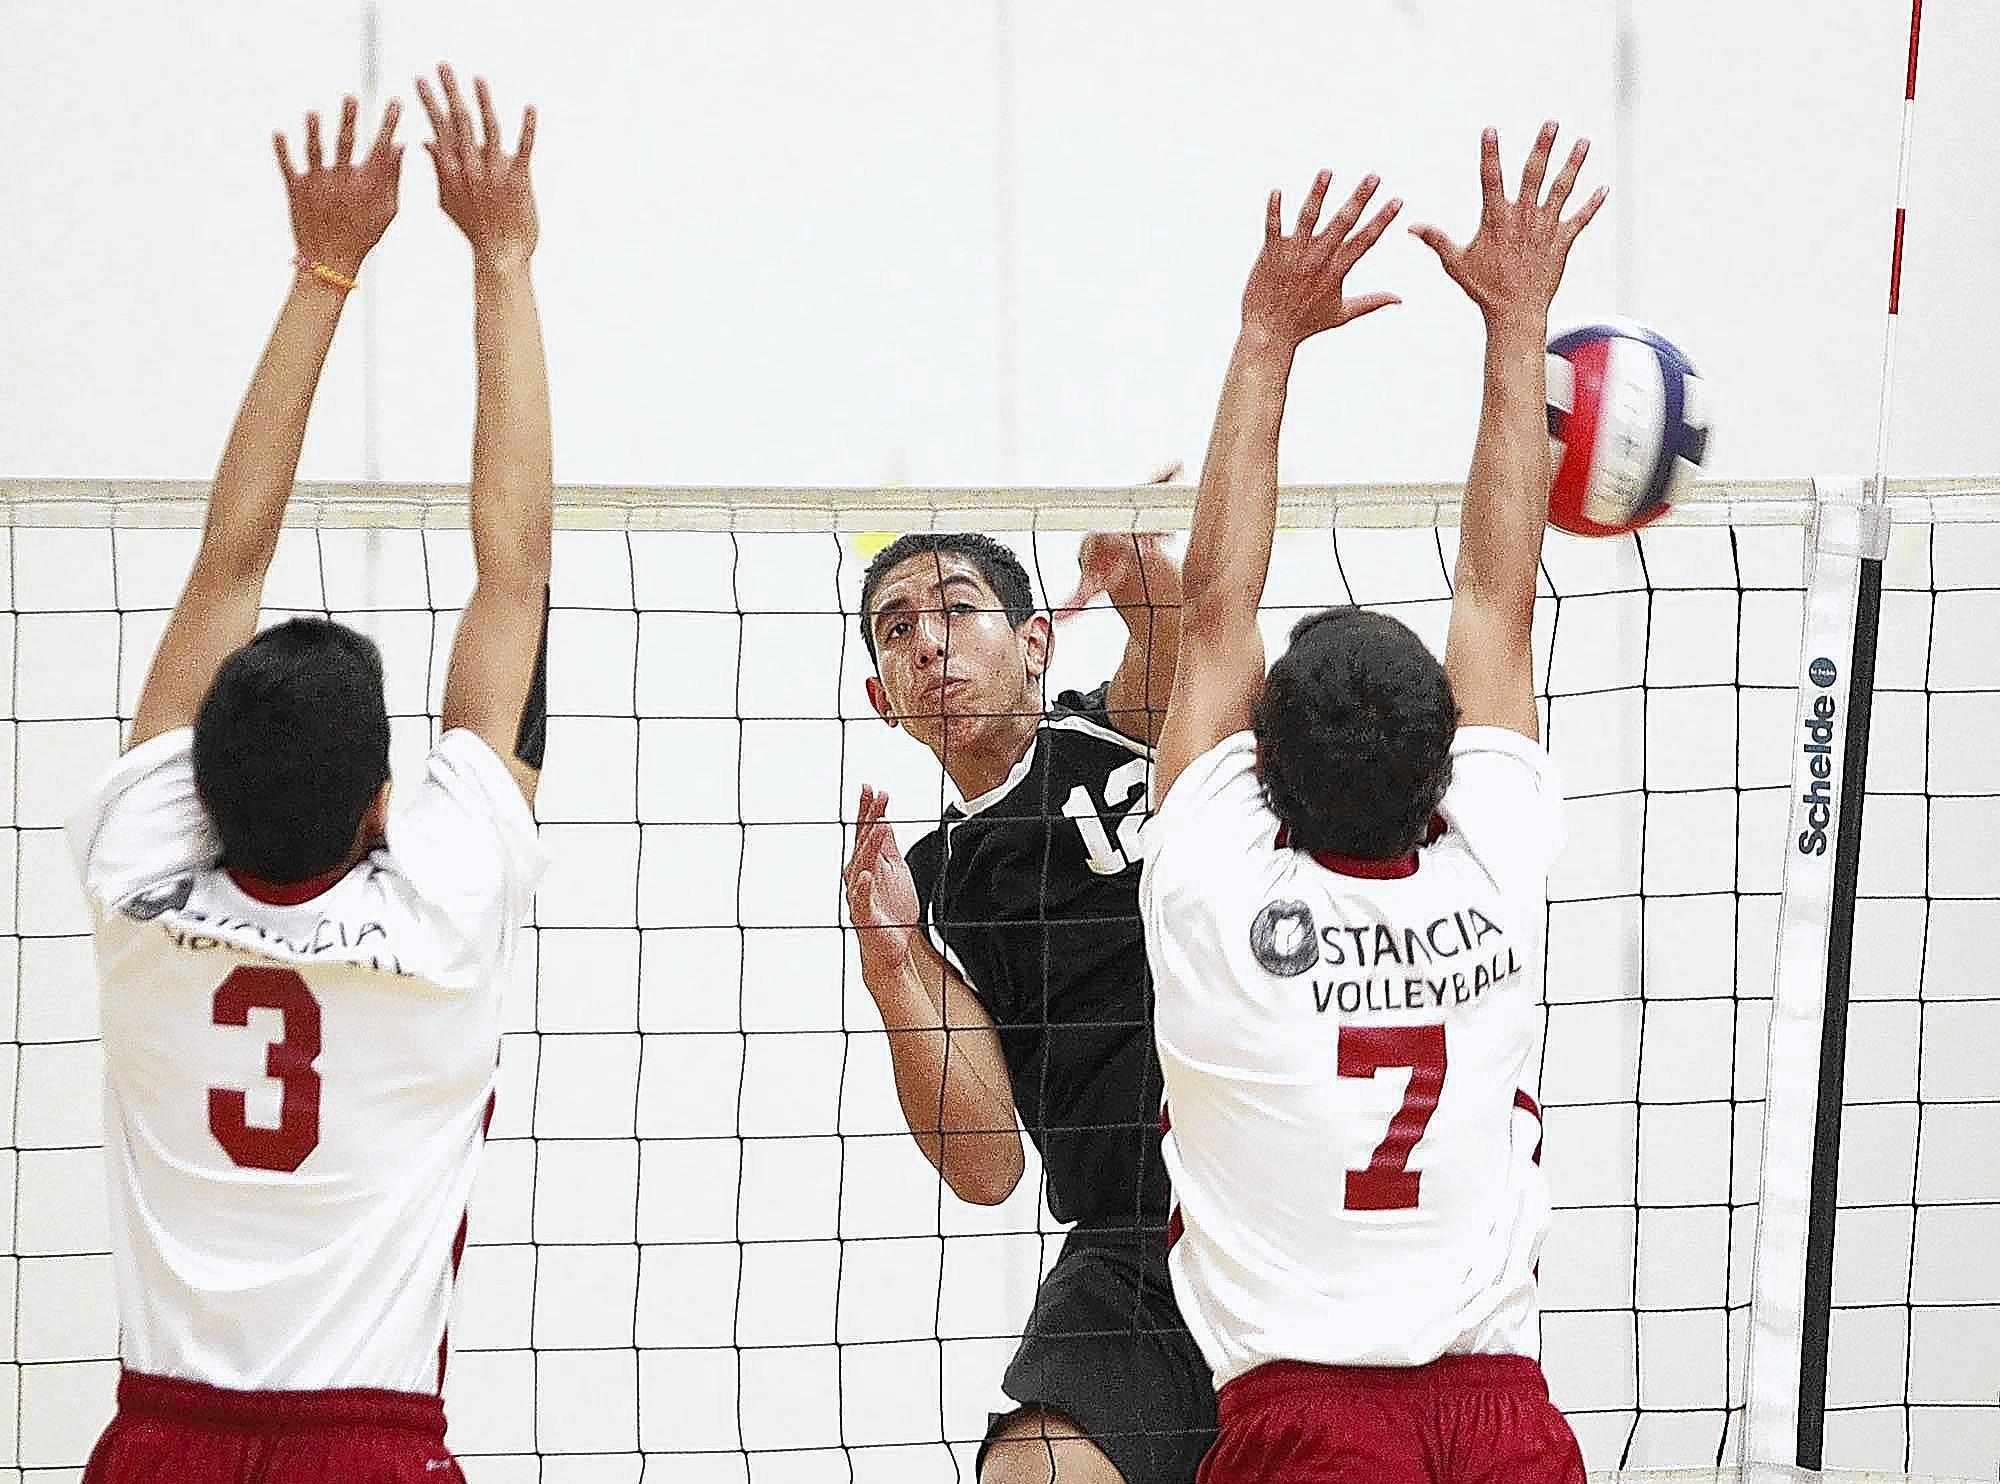 Costa Mesa High's Mason Tufuga puts the ball past Estancia's Dalton O'Daly (7) during an Orange Coast League match on Tuesday at Estancia High.